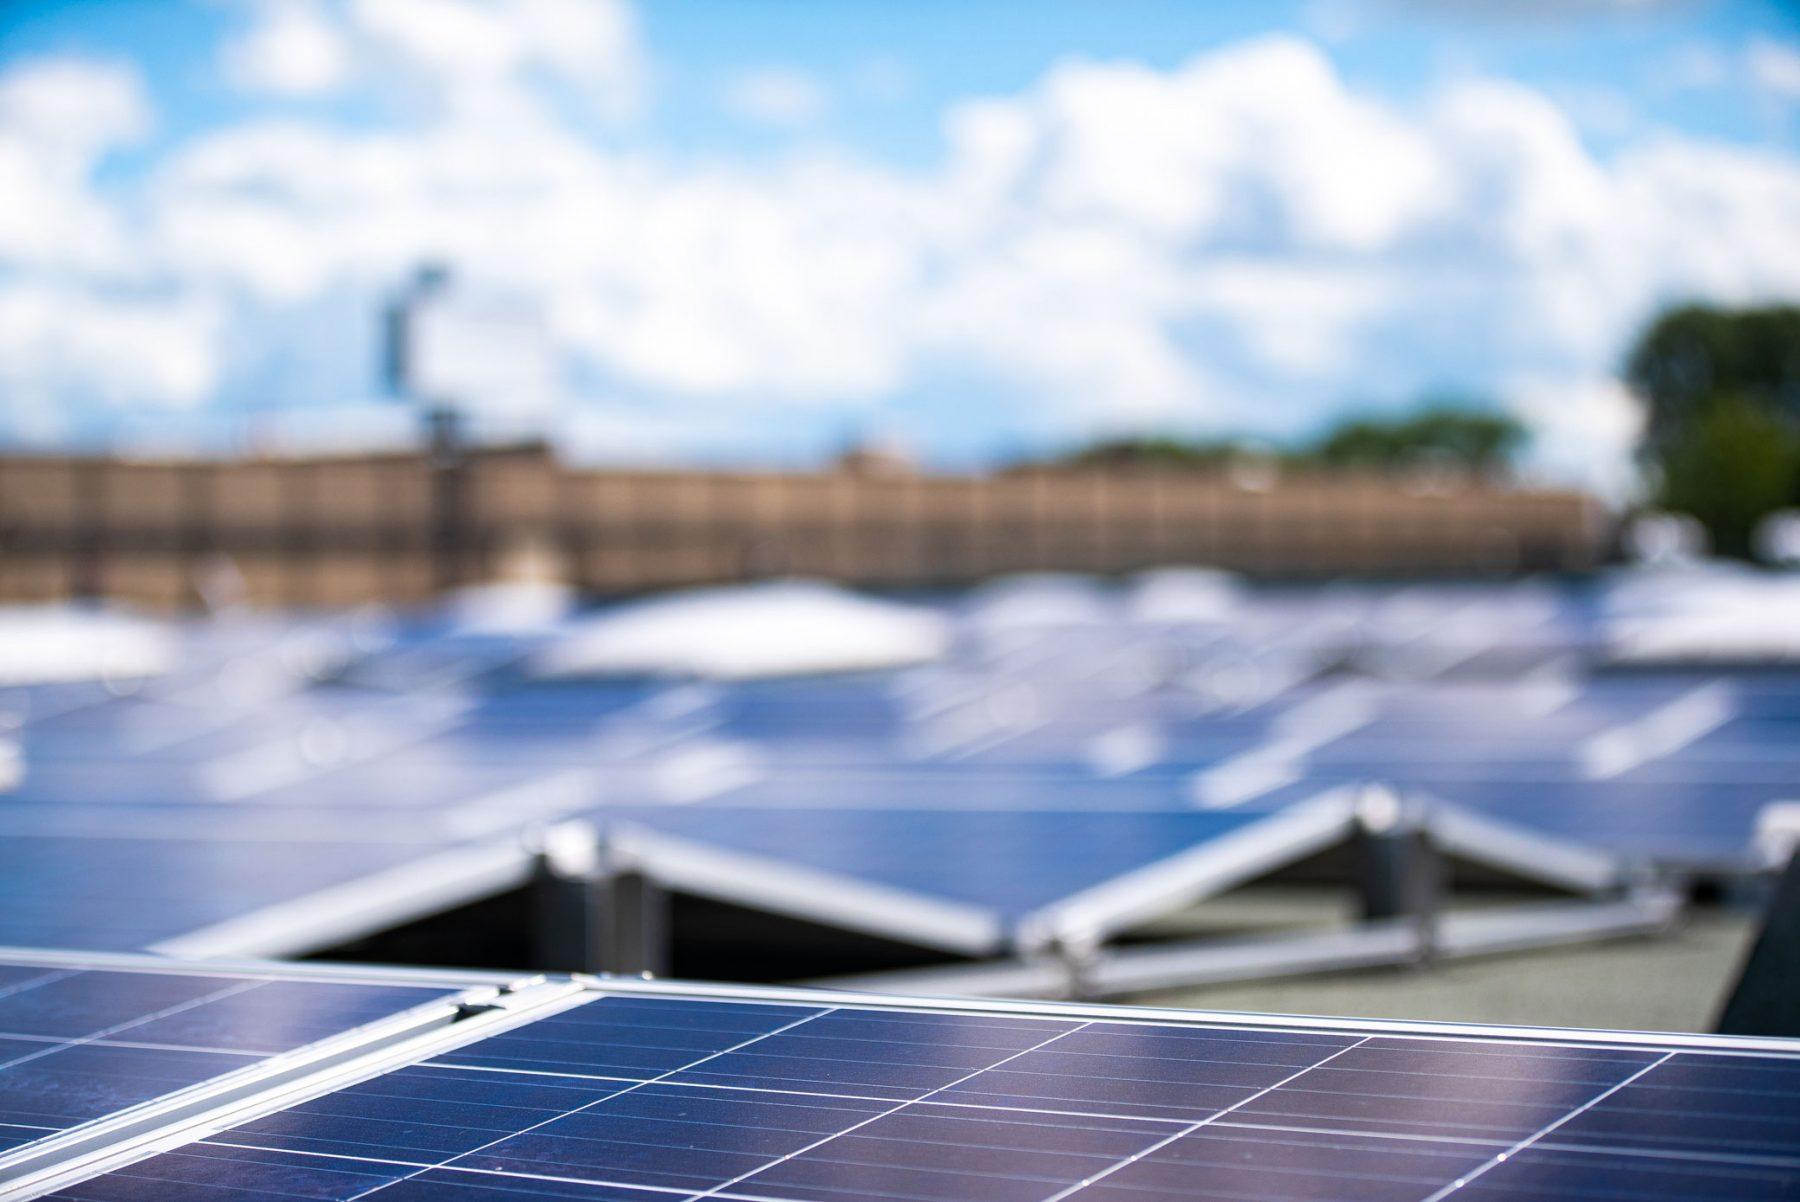 Photovoltaik-Anlage in Bielefeld